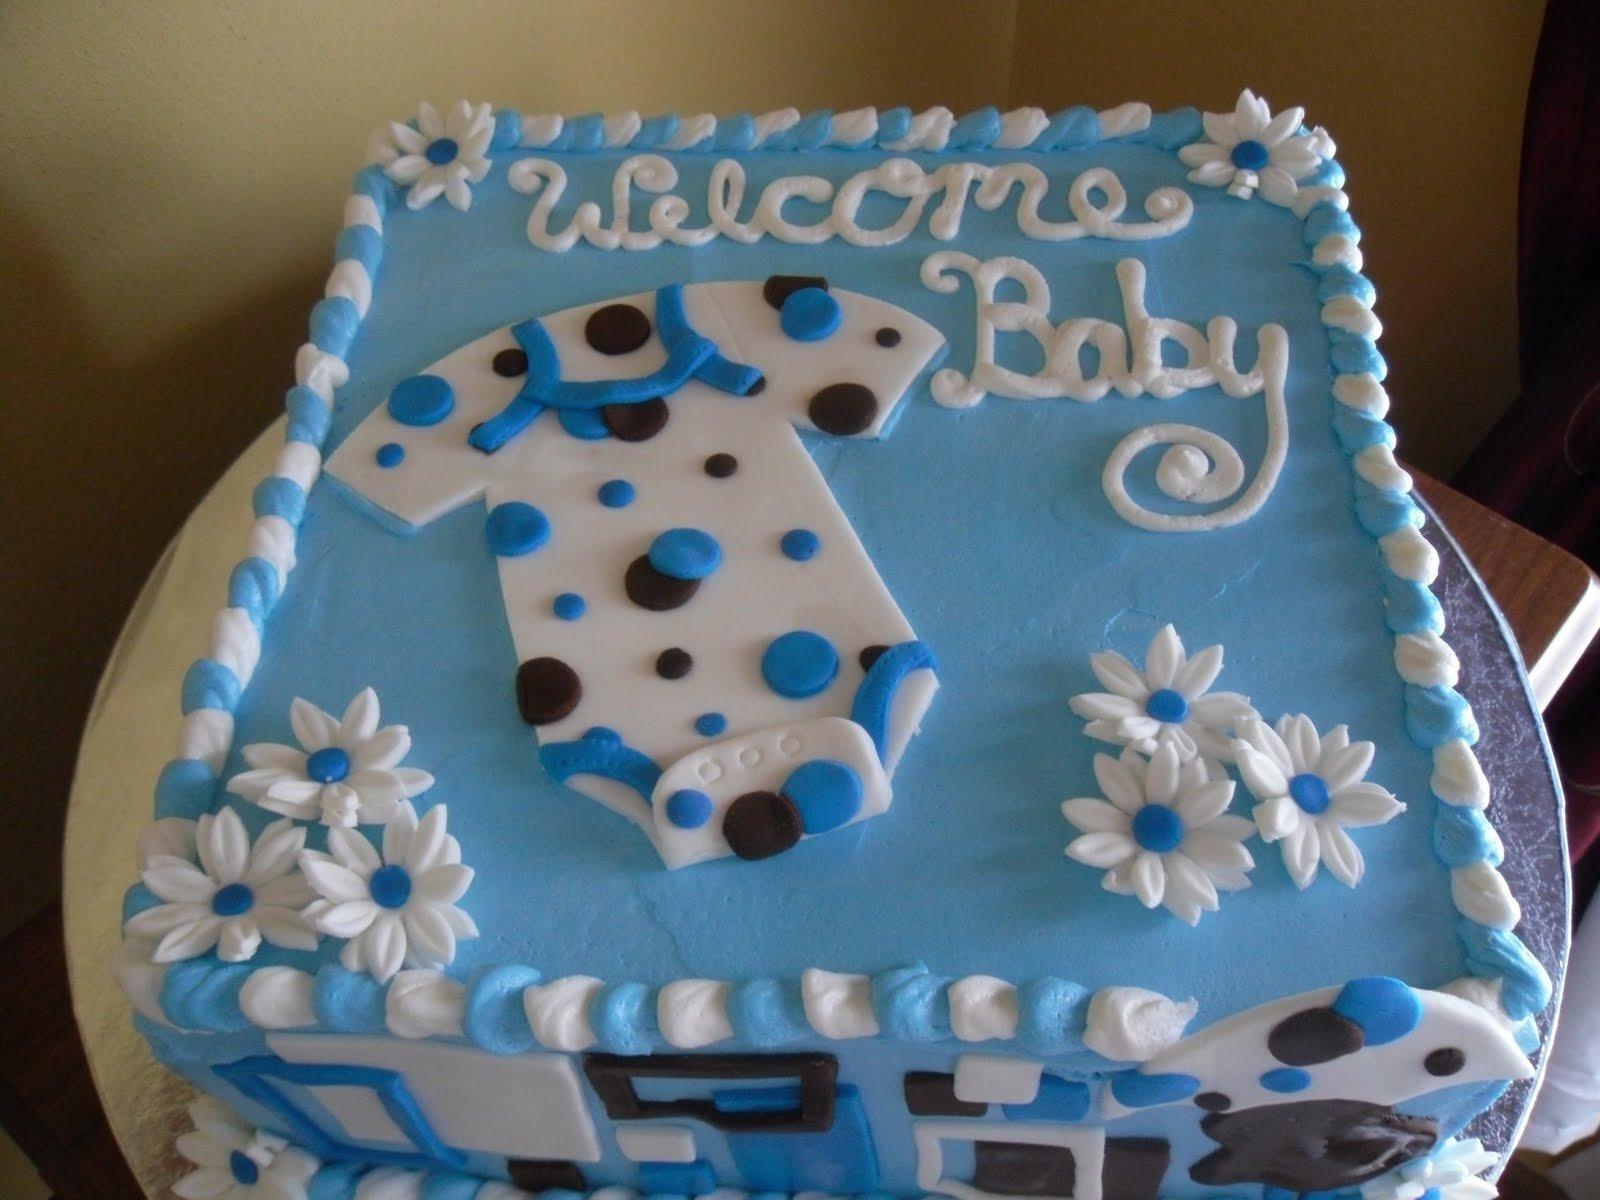 10 Spectacular Baby Shower Cake Decorating Ideas cake decorating ideas for baby boy shower e280a2 baby showers design 2020